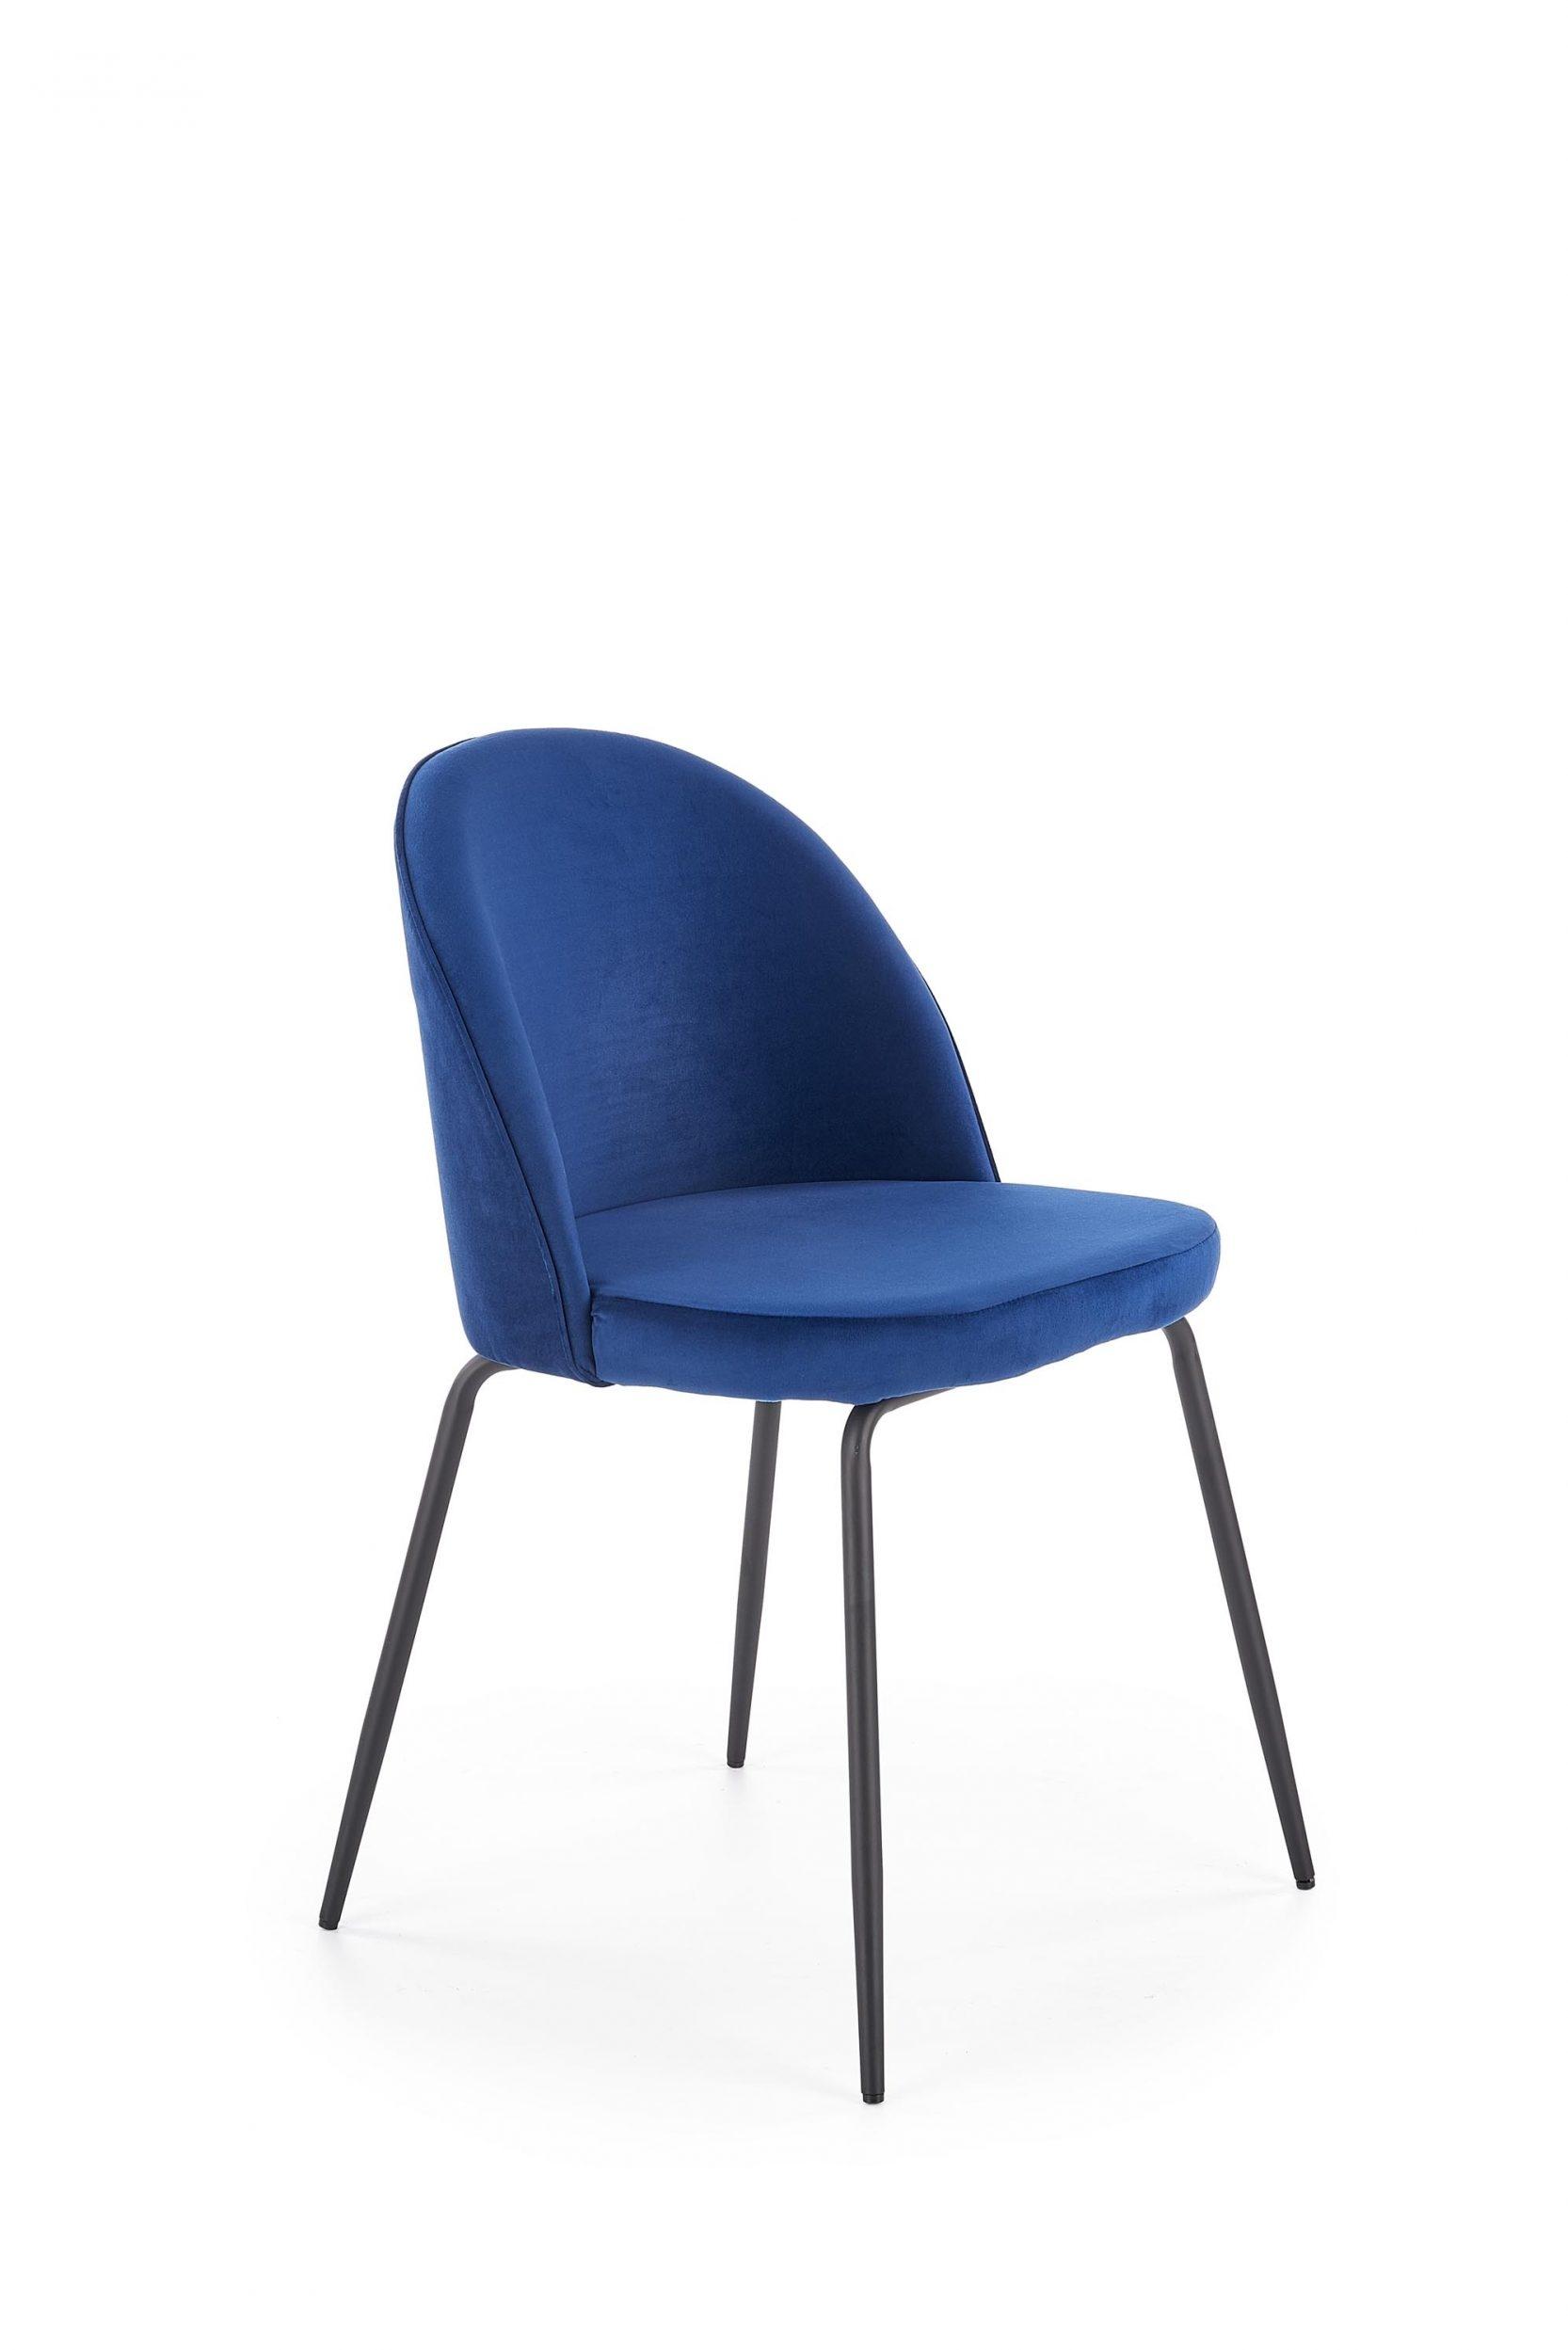 Scaun tapitat cu stofa, cu picioare metalice K314 Albastru inchis / Negru, l49xA50xH80 cm